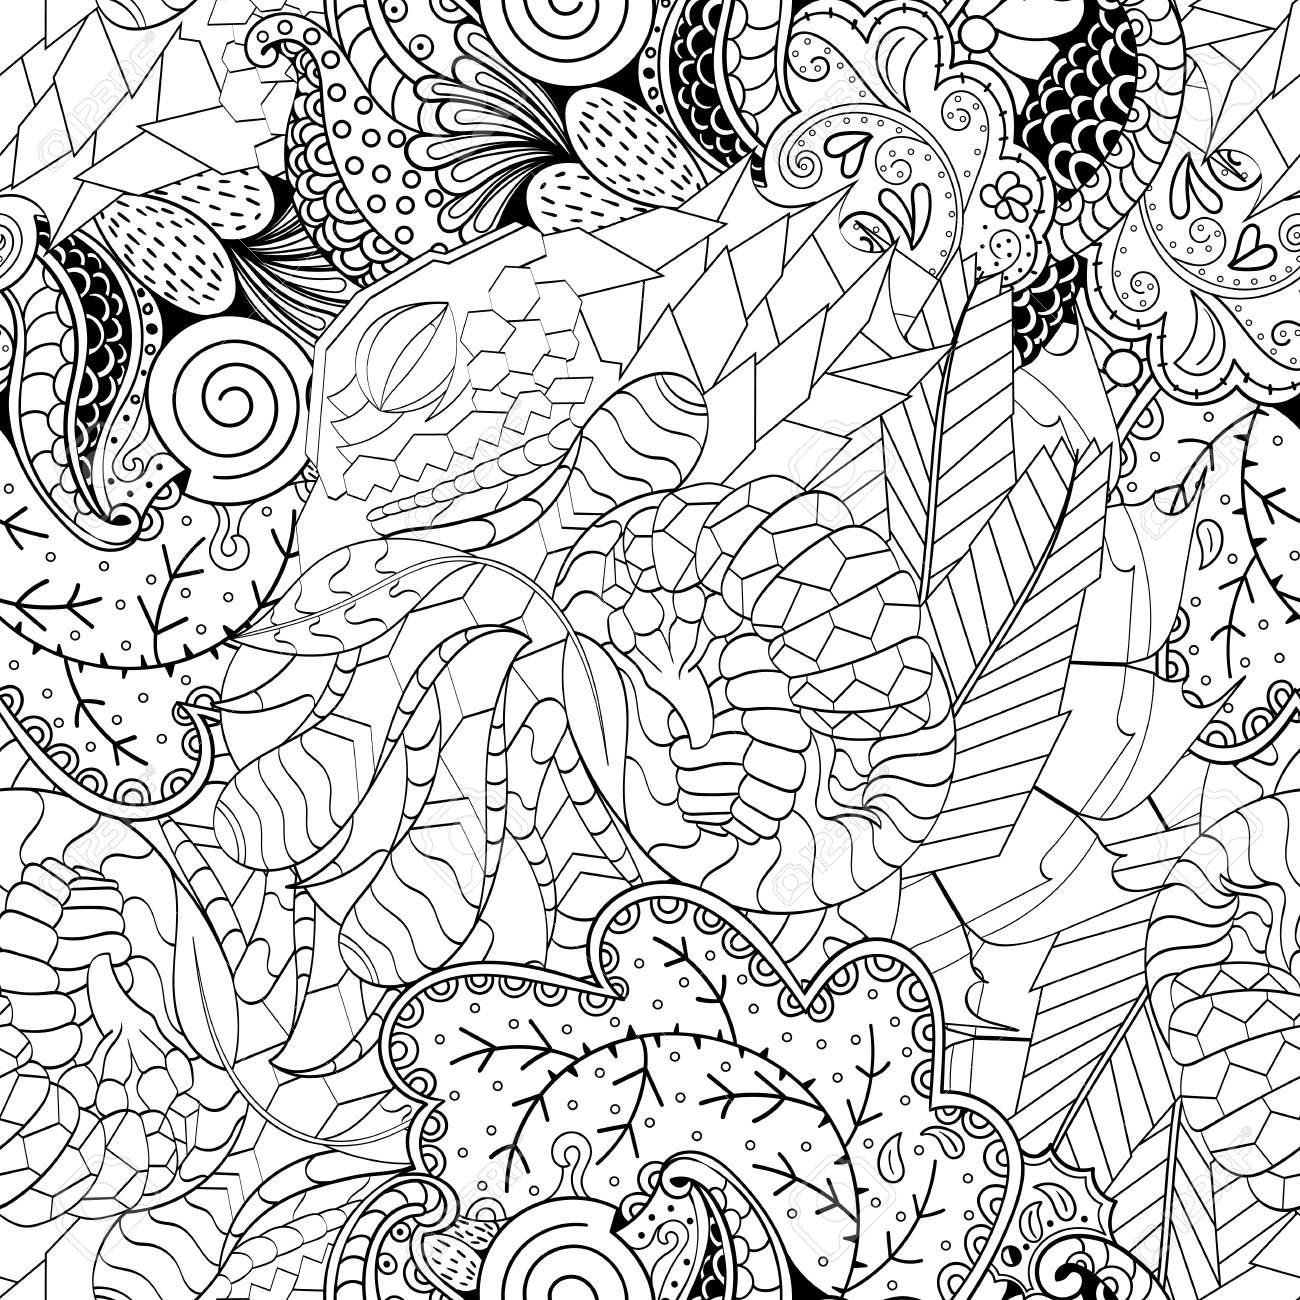 tracery seamless calming pattern mehndi design neat even 23 in Binary tracery seamless calming pattern mehndi design neat even monochrome binary harmonious texture algae